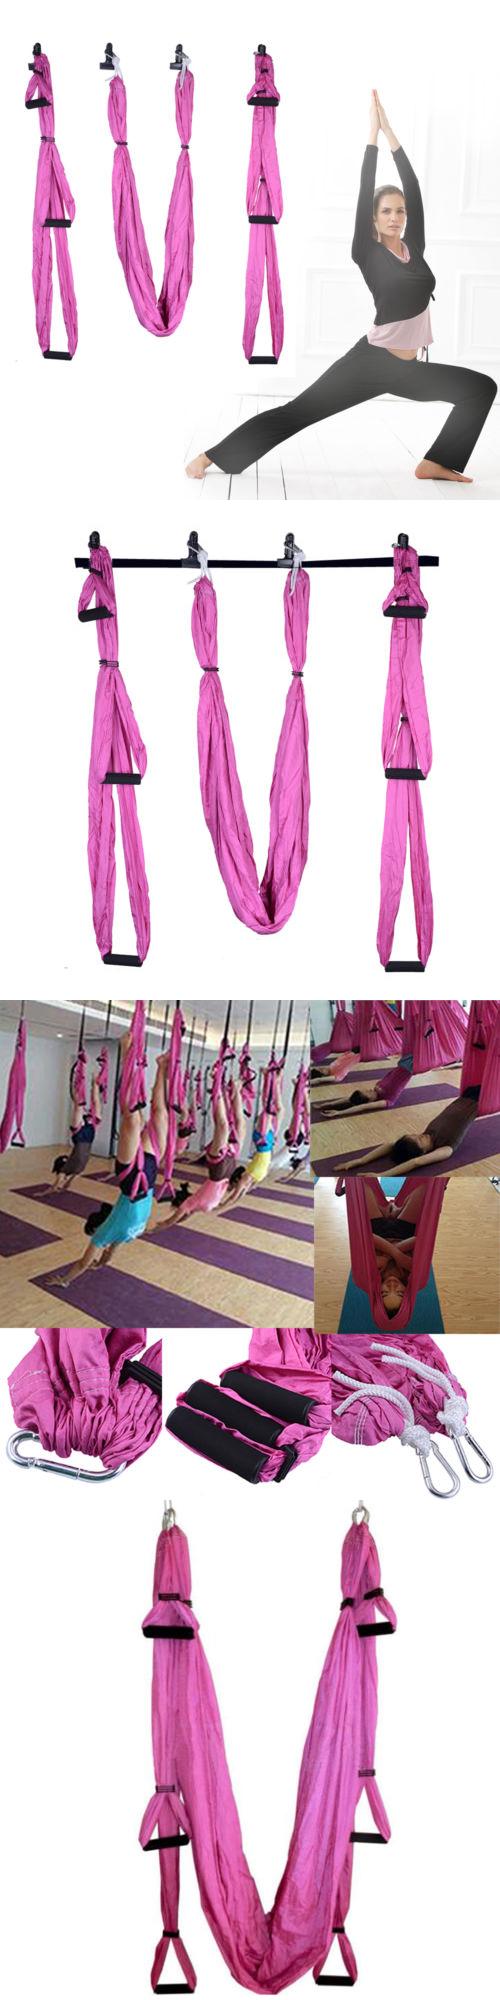 Yoga props large bearing yoga swing sling hammock trapeze